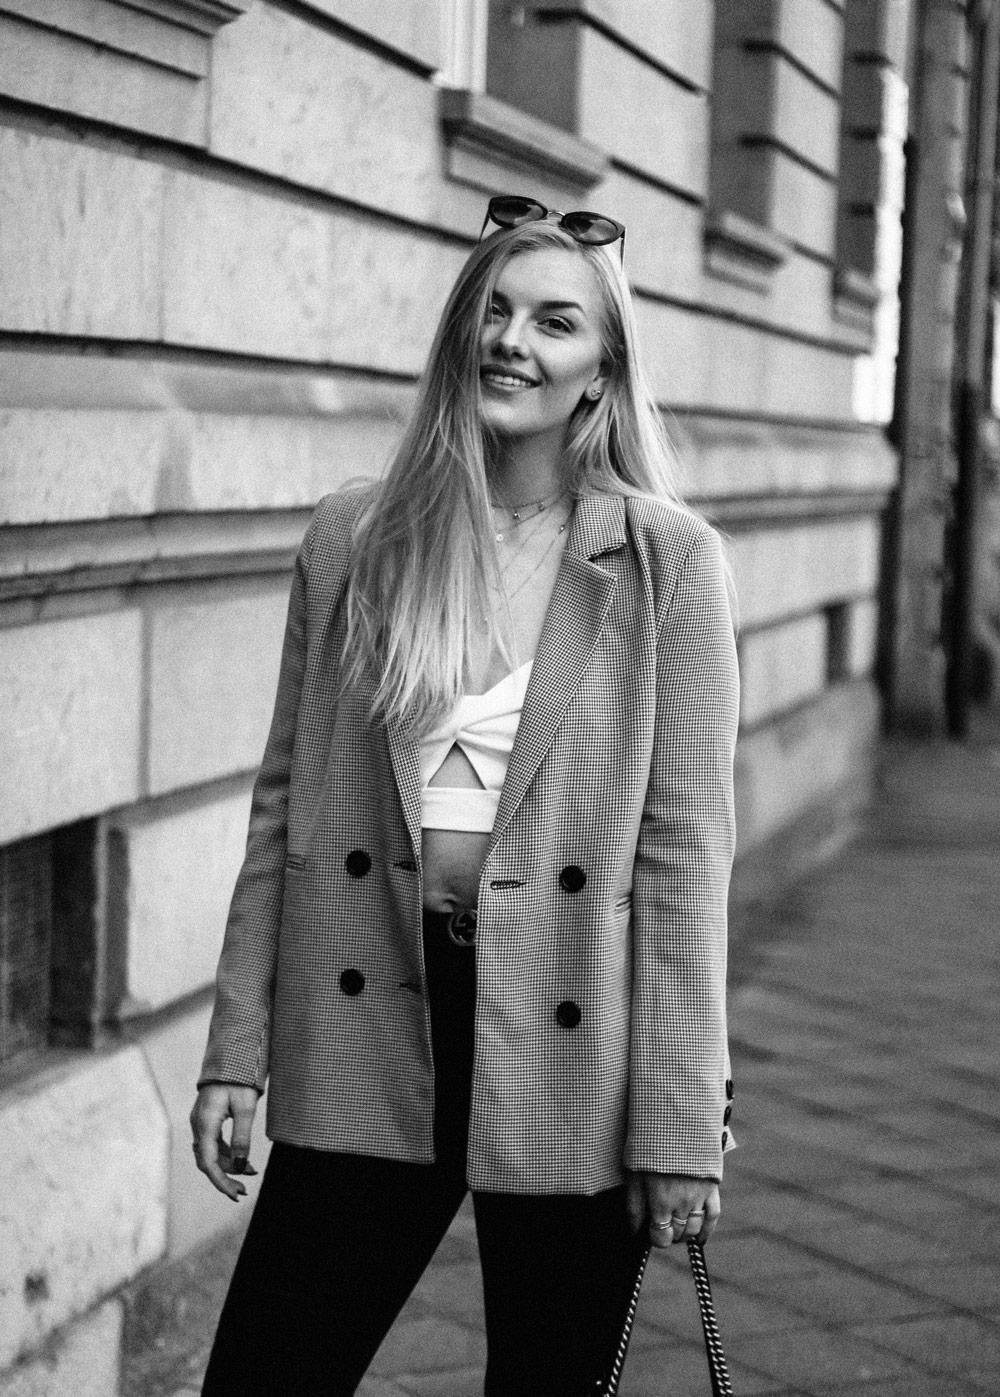 Eva-Jasmin-Balenciaga-Lookalikes-Gucci-Marmont-Streetstyle